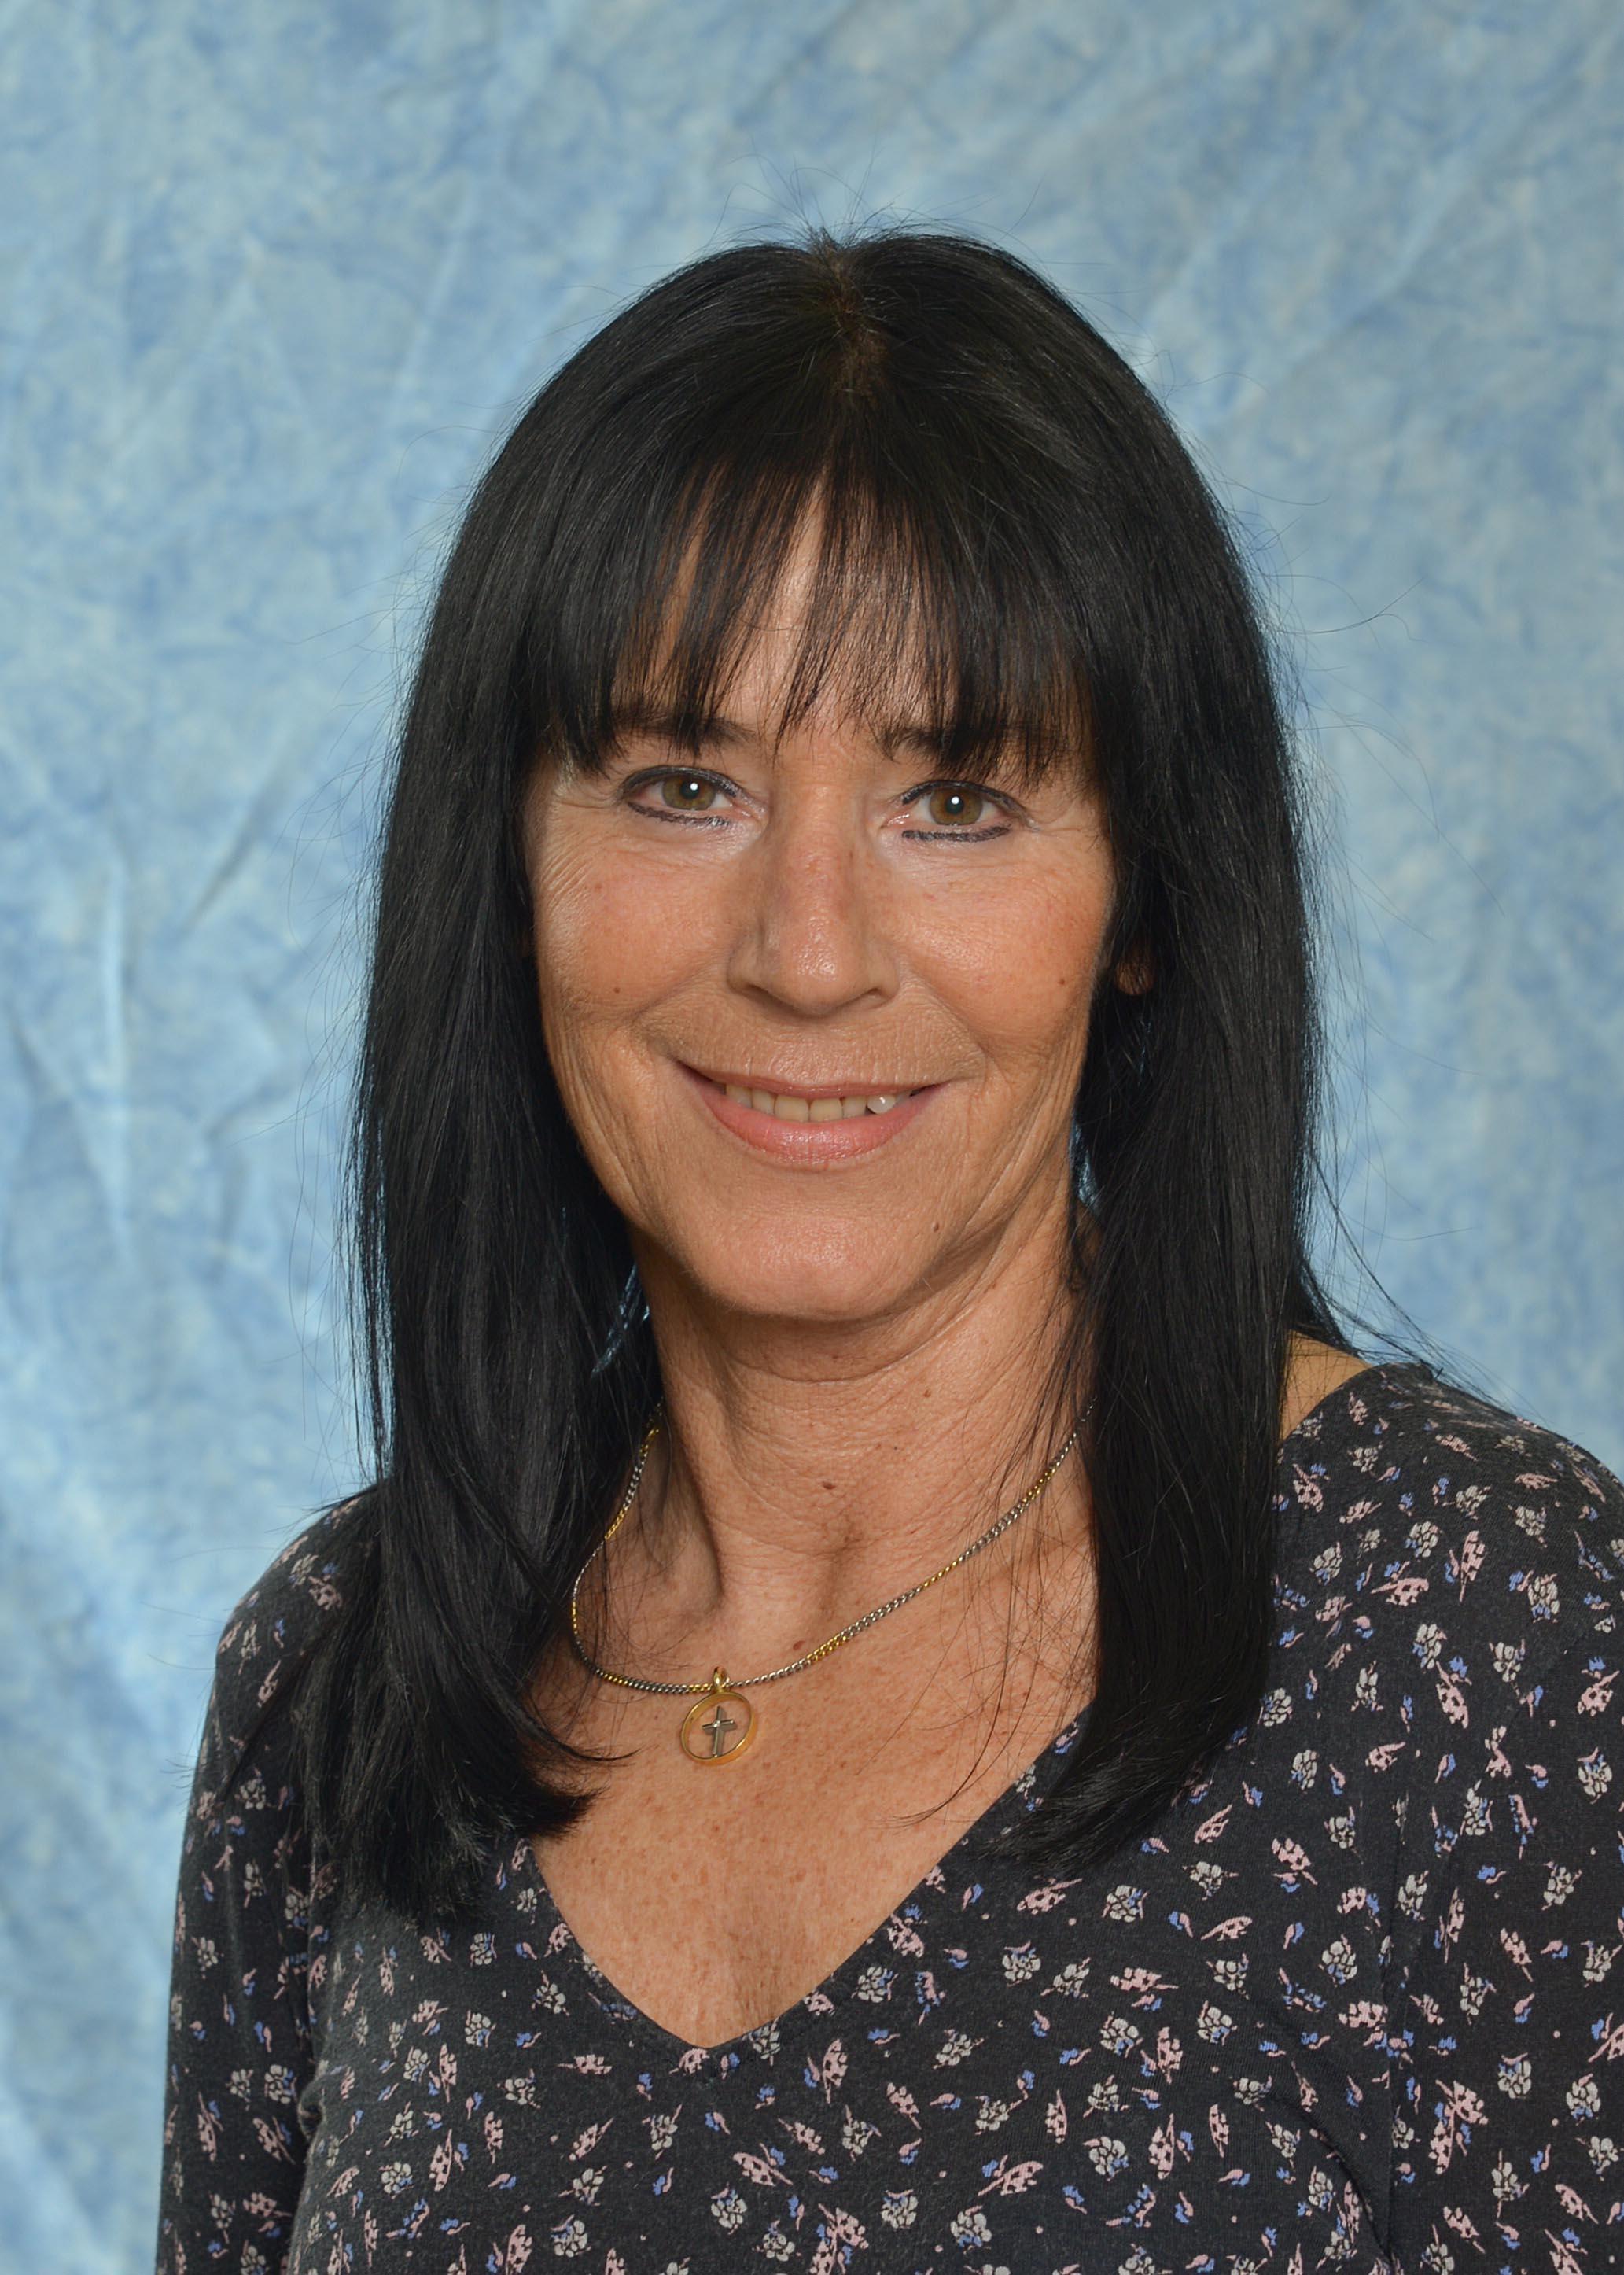 Elisabeth Schmitt